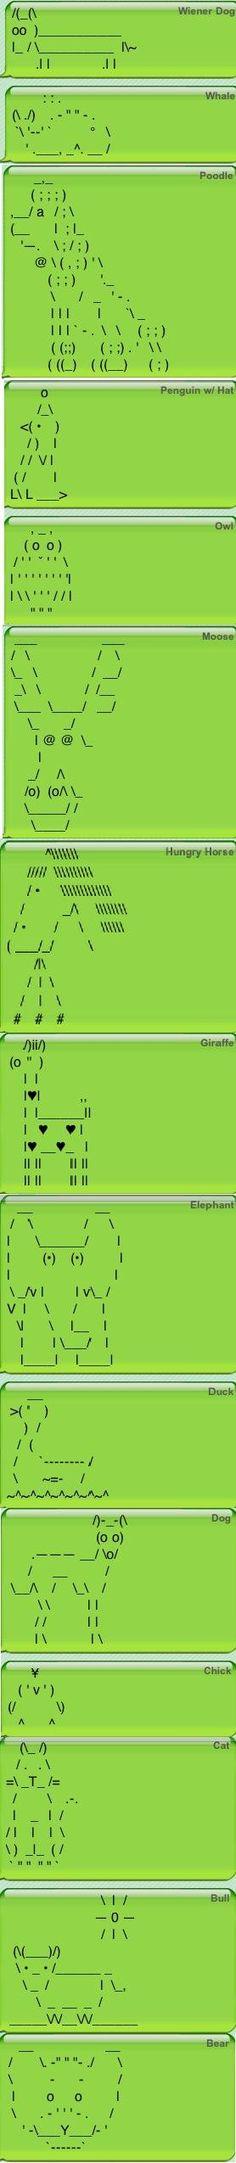 textpics ANIMALS